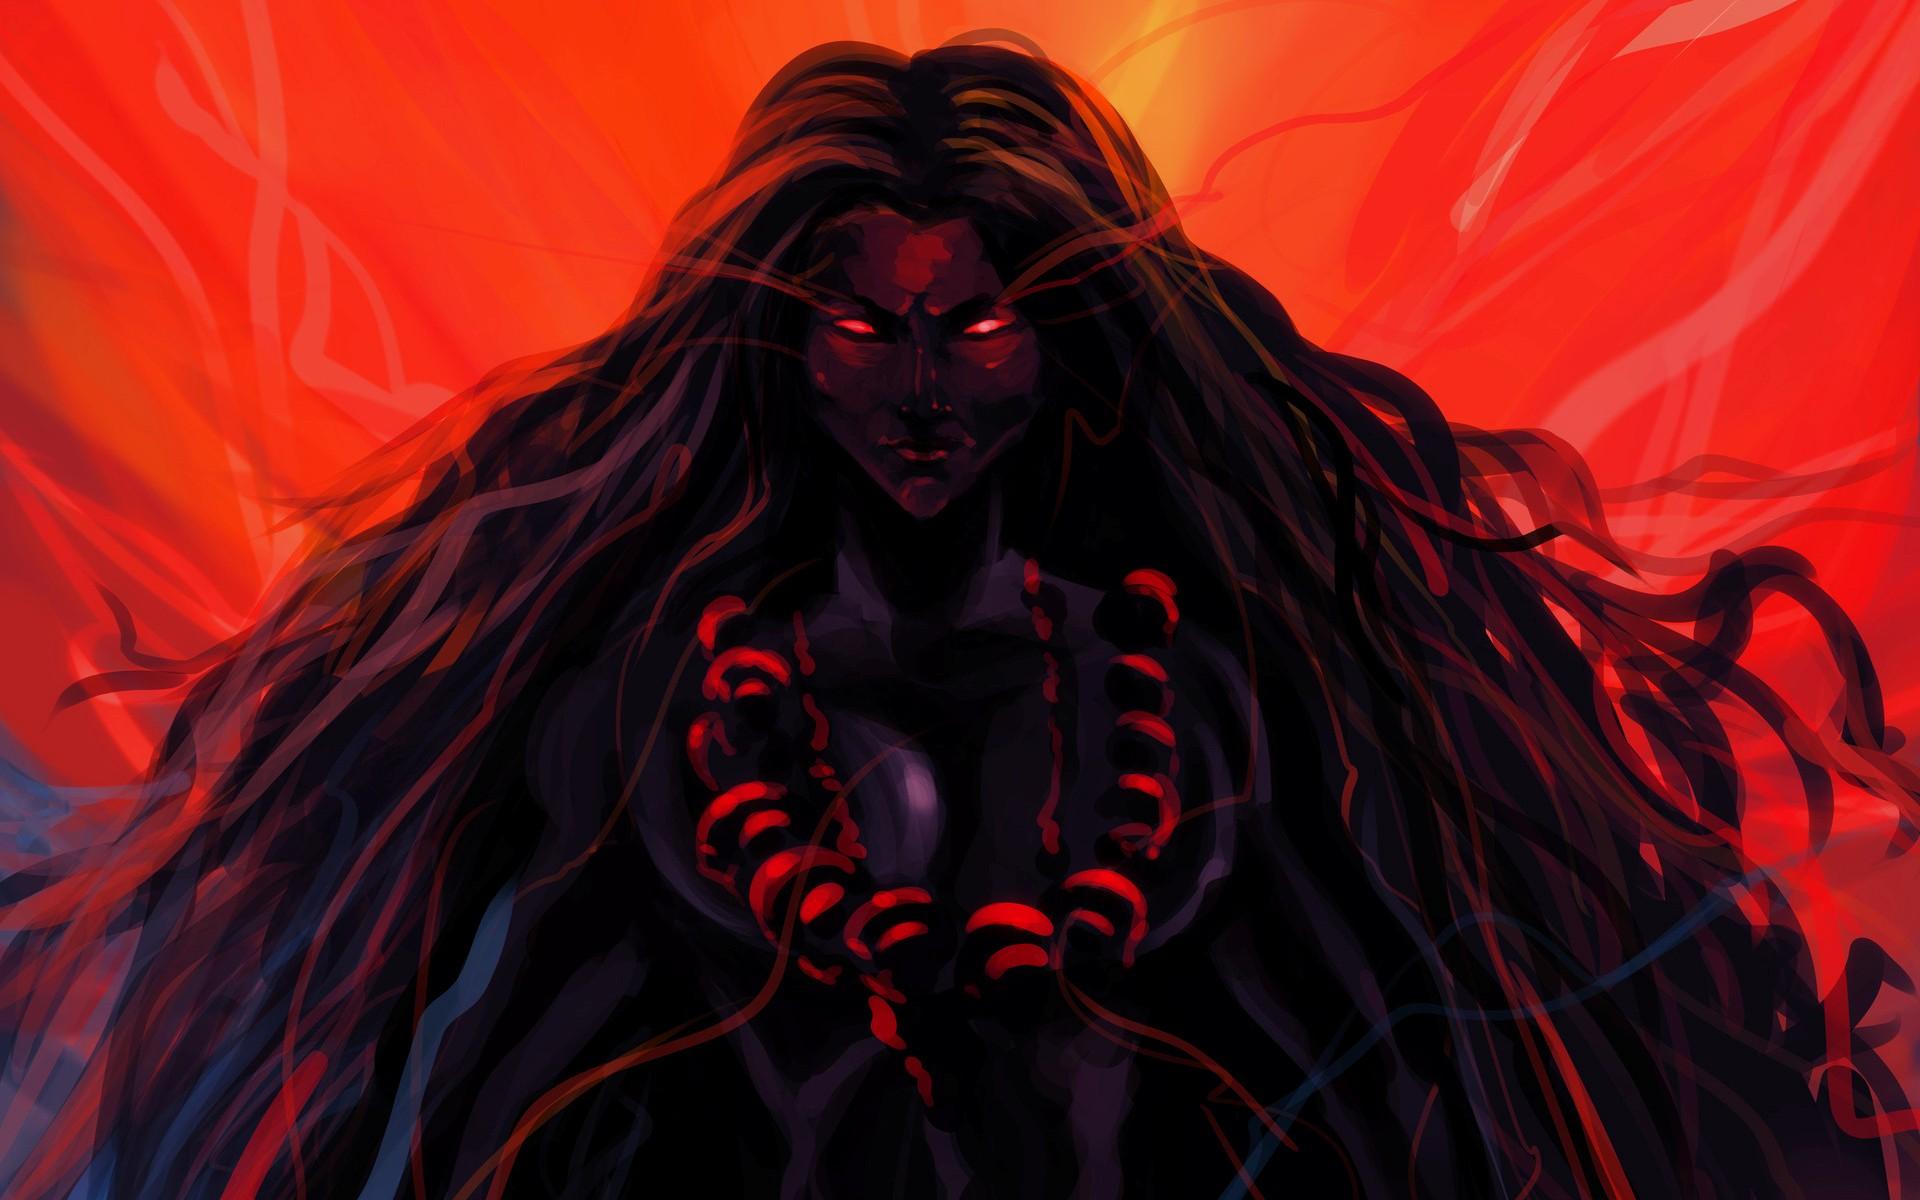 the dark mother goddess kali wallpapers - 1920x1200 - 312101